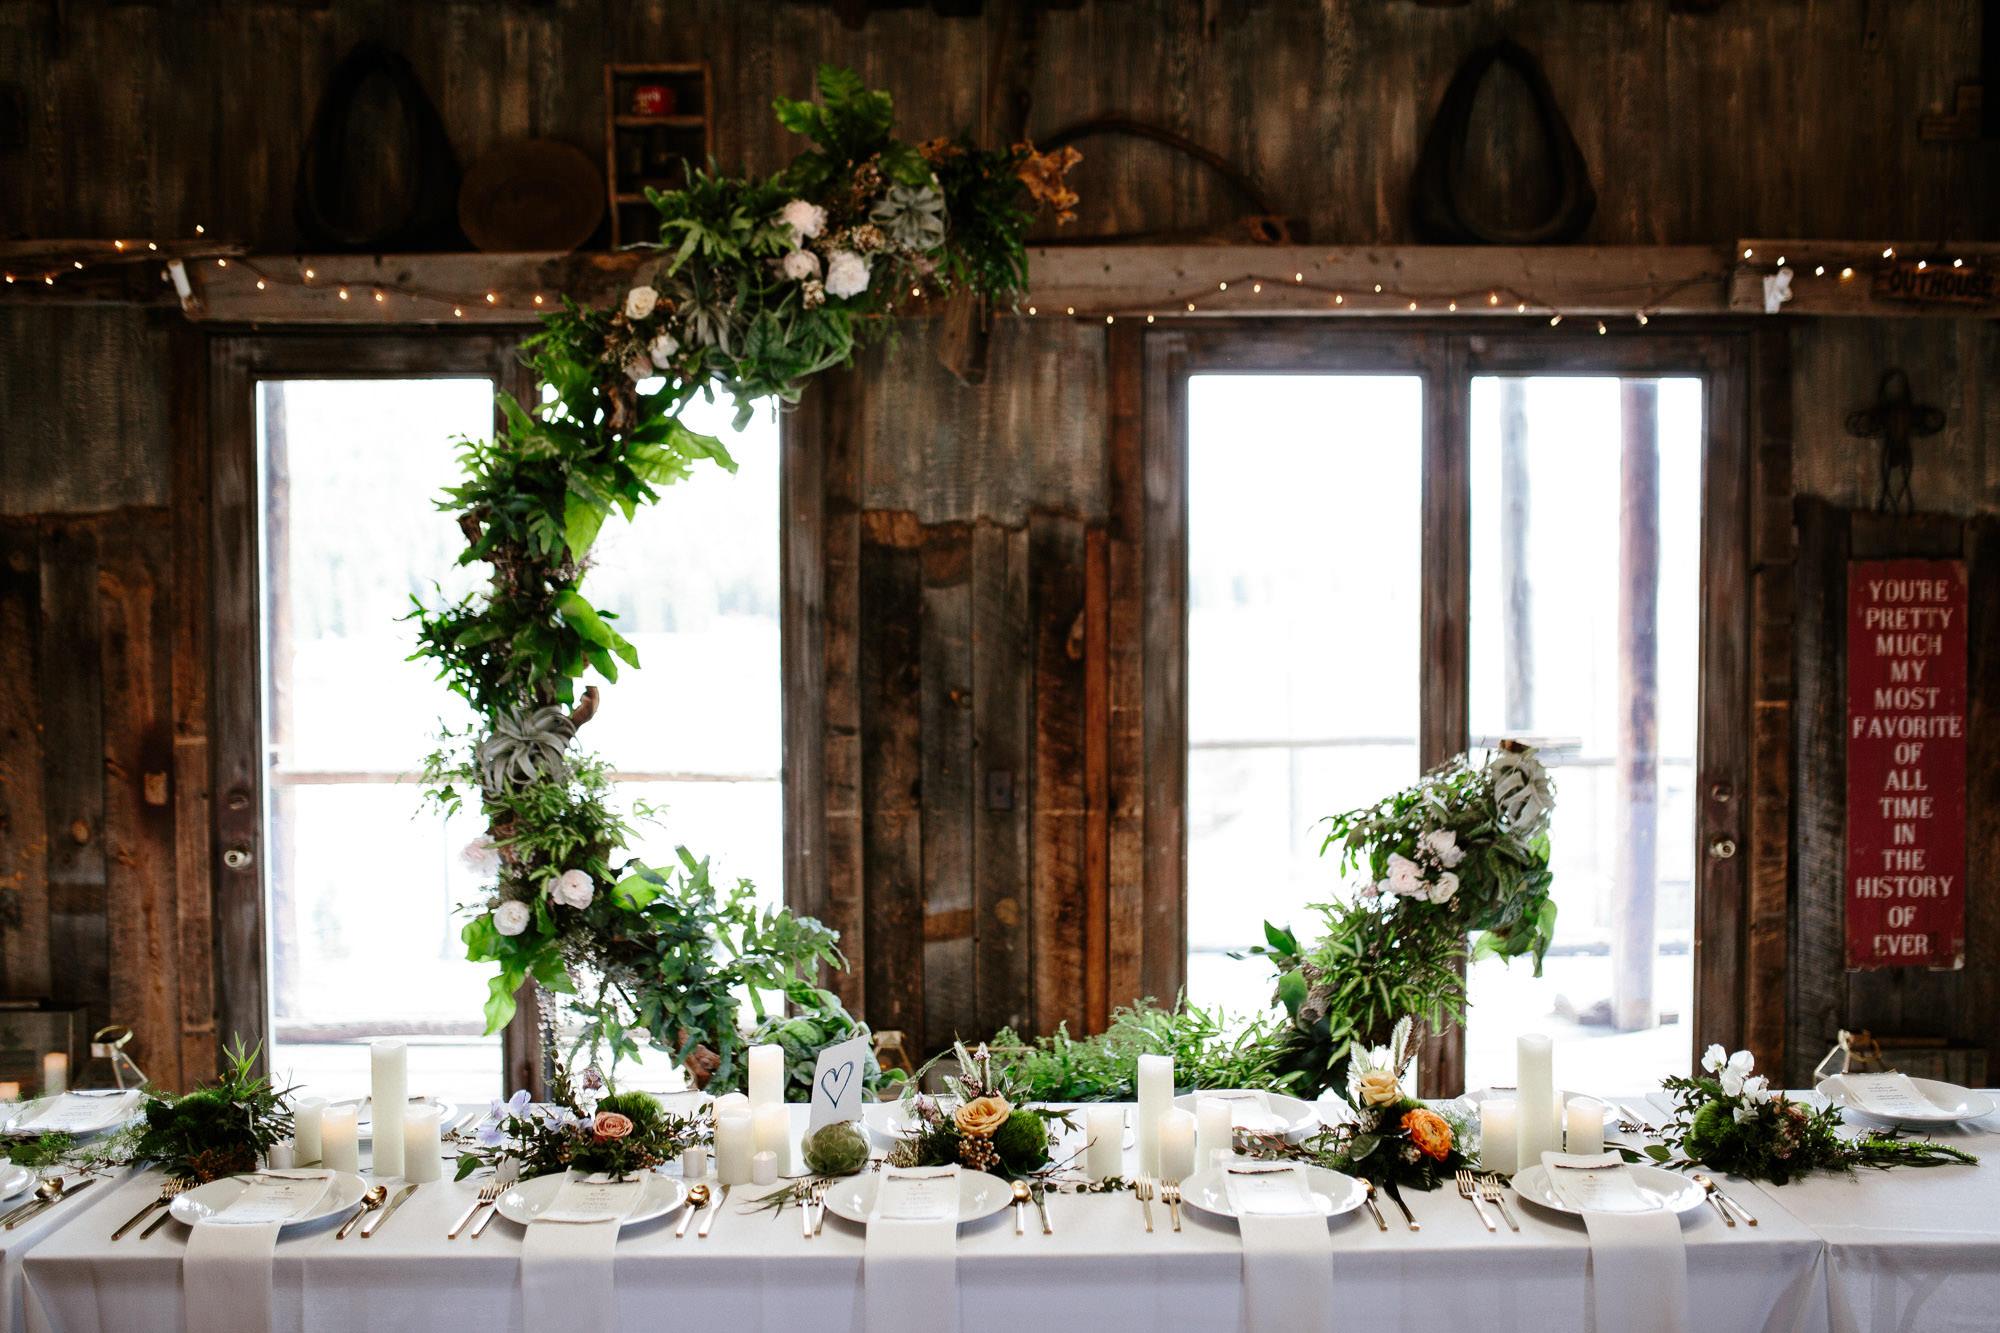 bucci-barn-wedding-elopement-evergreen-boulder-denver-colorado-adventerous-romantic-timeless-071.jpg